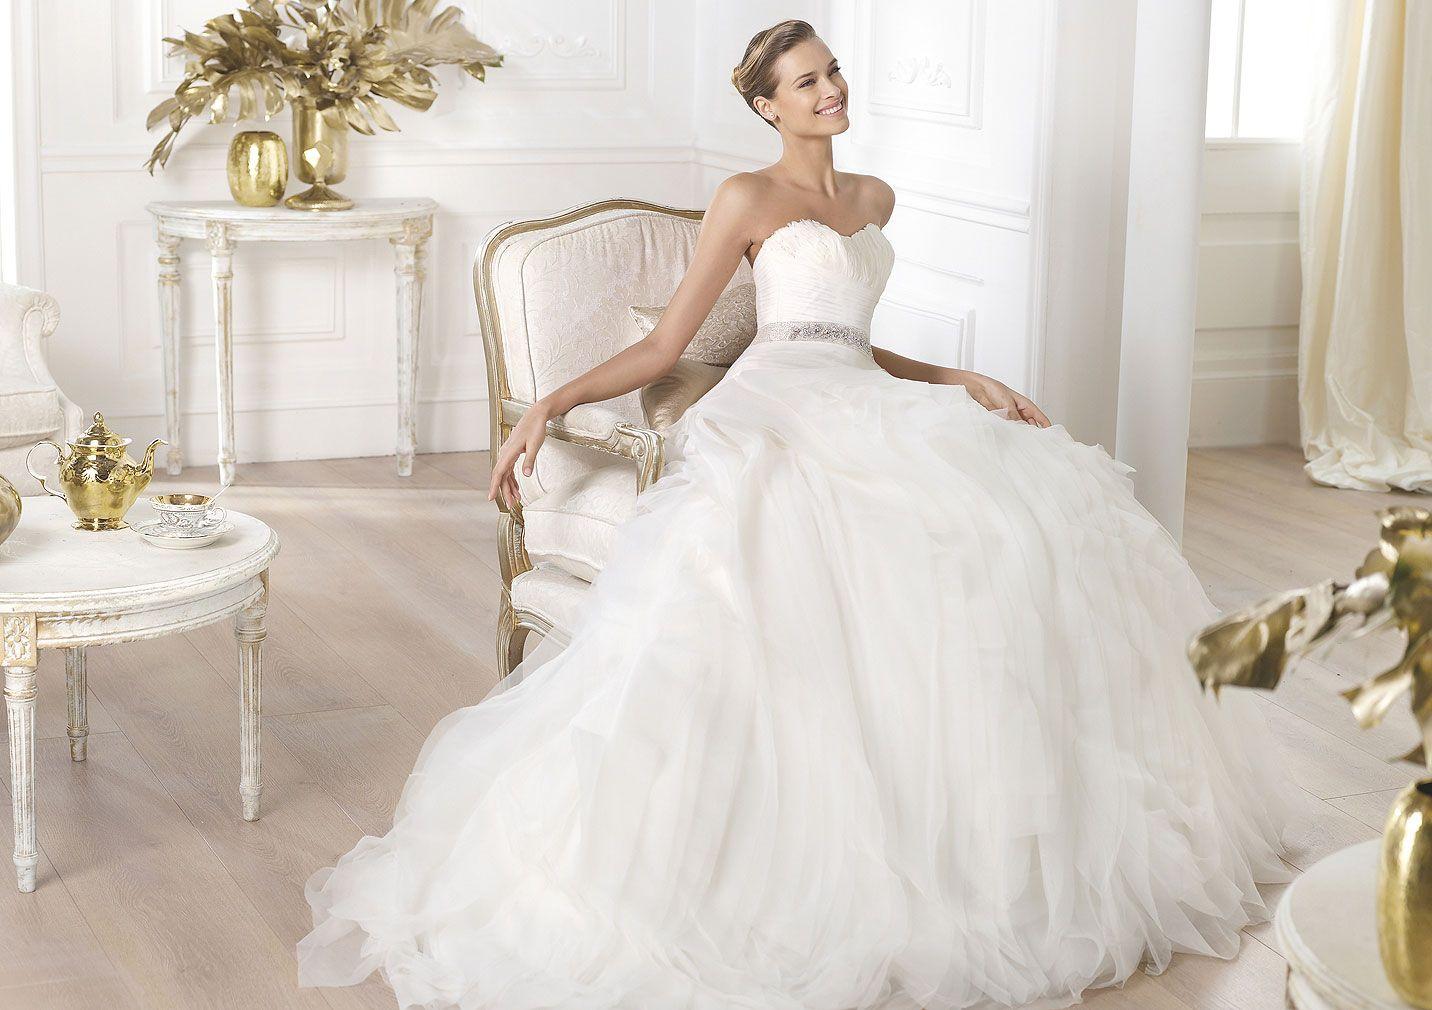 wedding dress LEINA Wedding dress with feather trim on bust Pronovias Pronovias